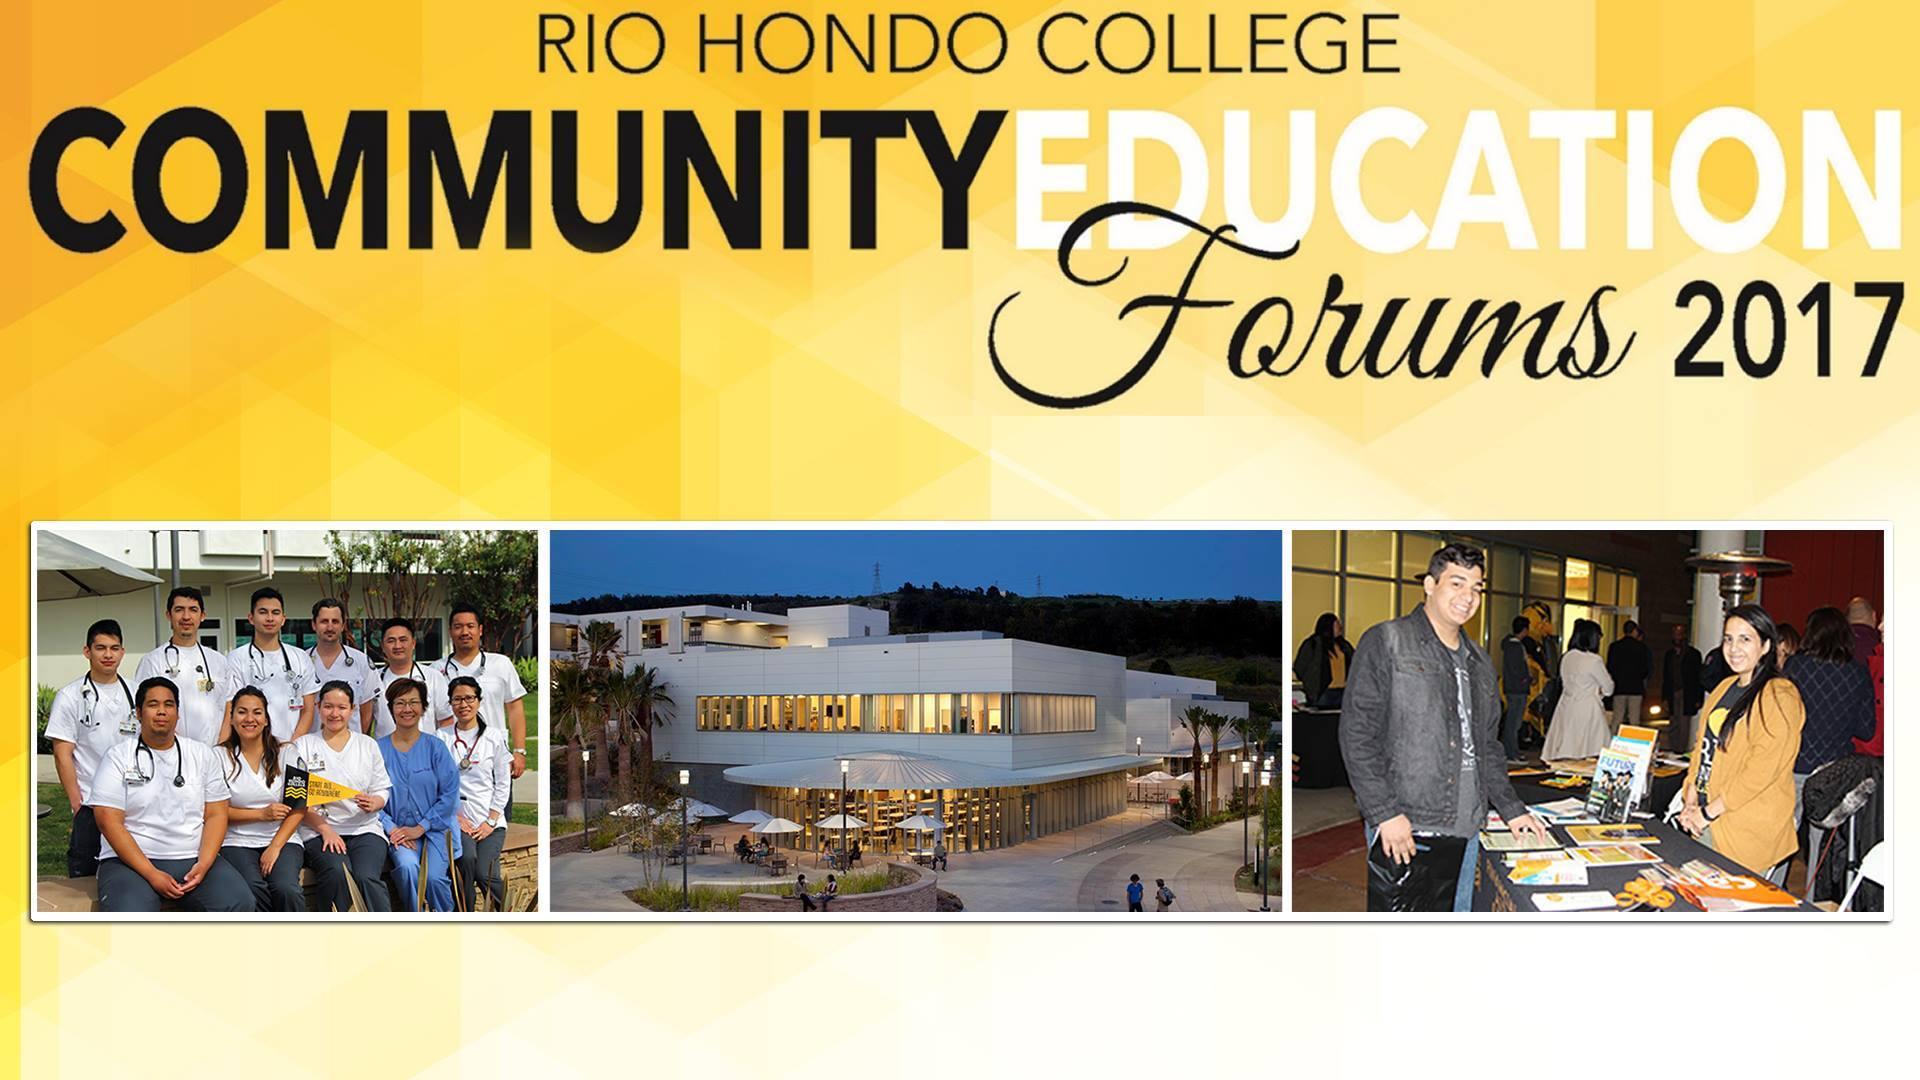 Rio Hondo College Community Education Forum Showcases Stellar